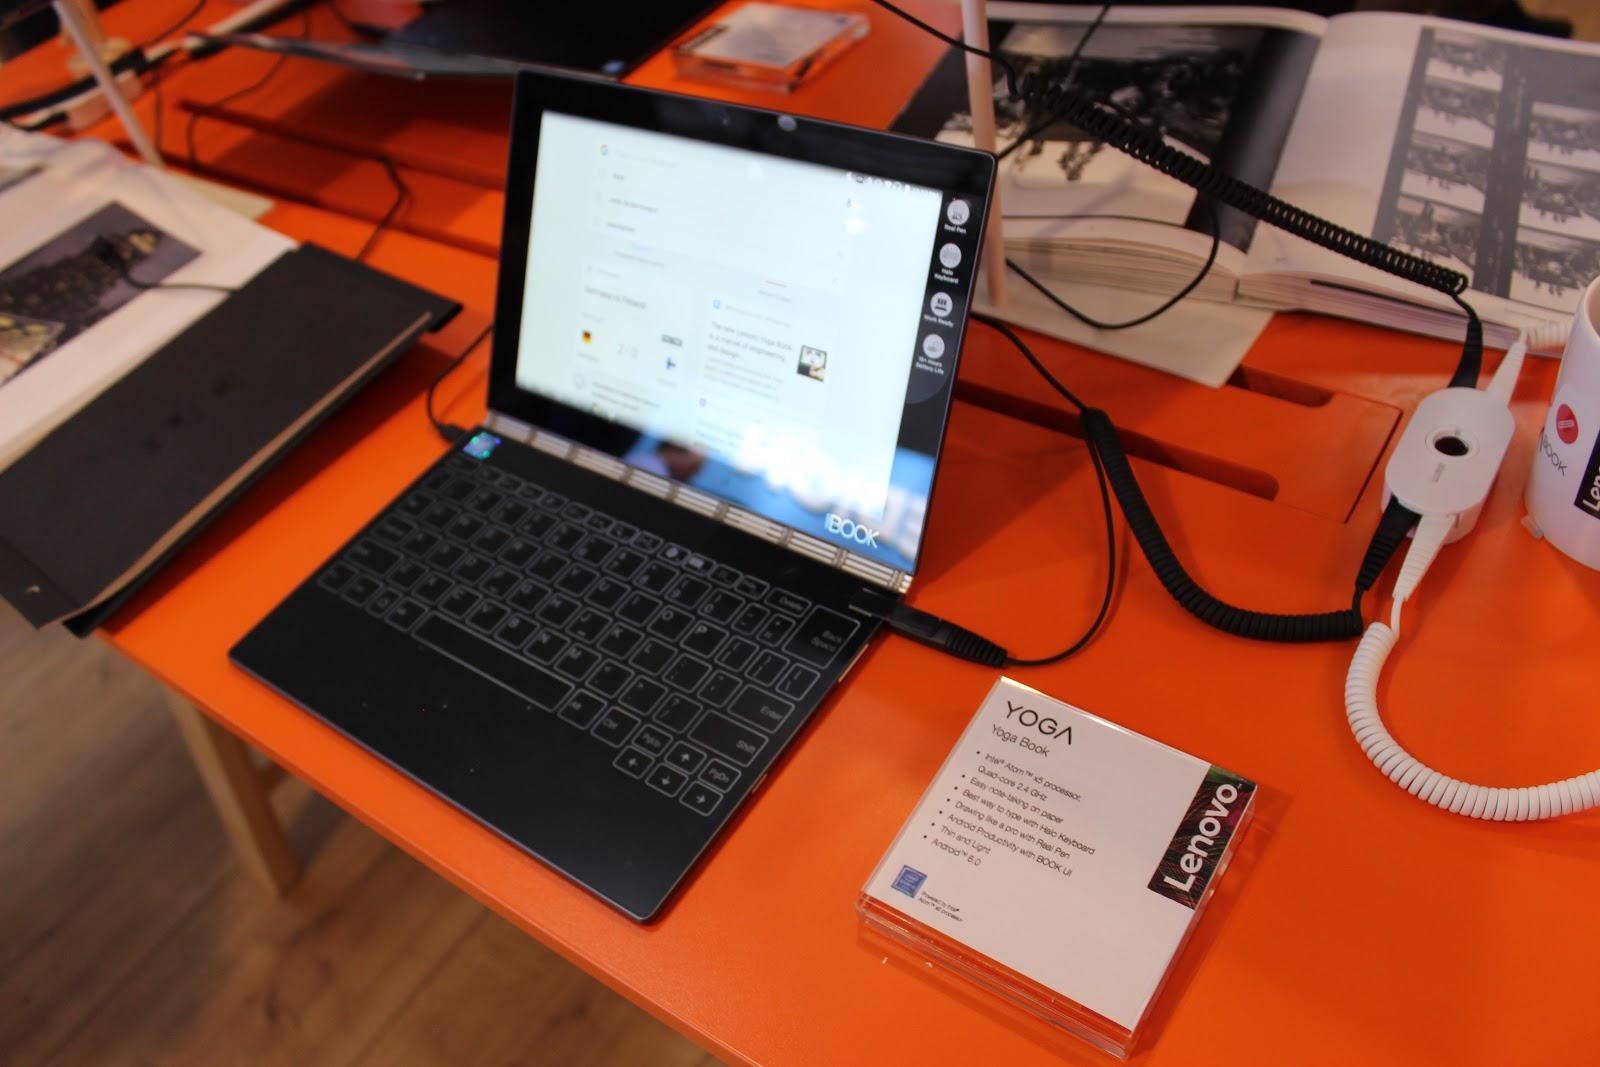 Гвоздь программы: Lenovo YOGA Book на IFA 2016 - 2